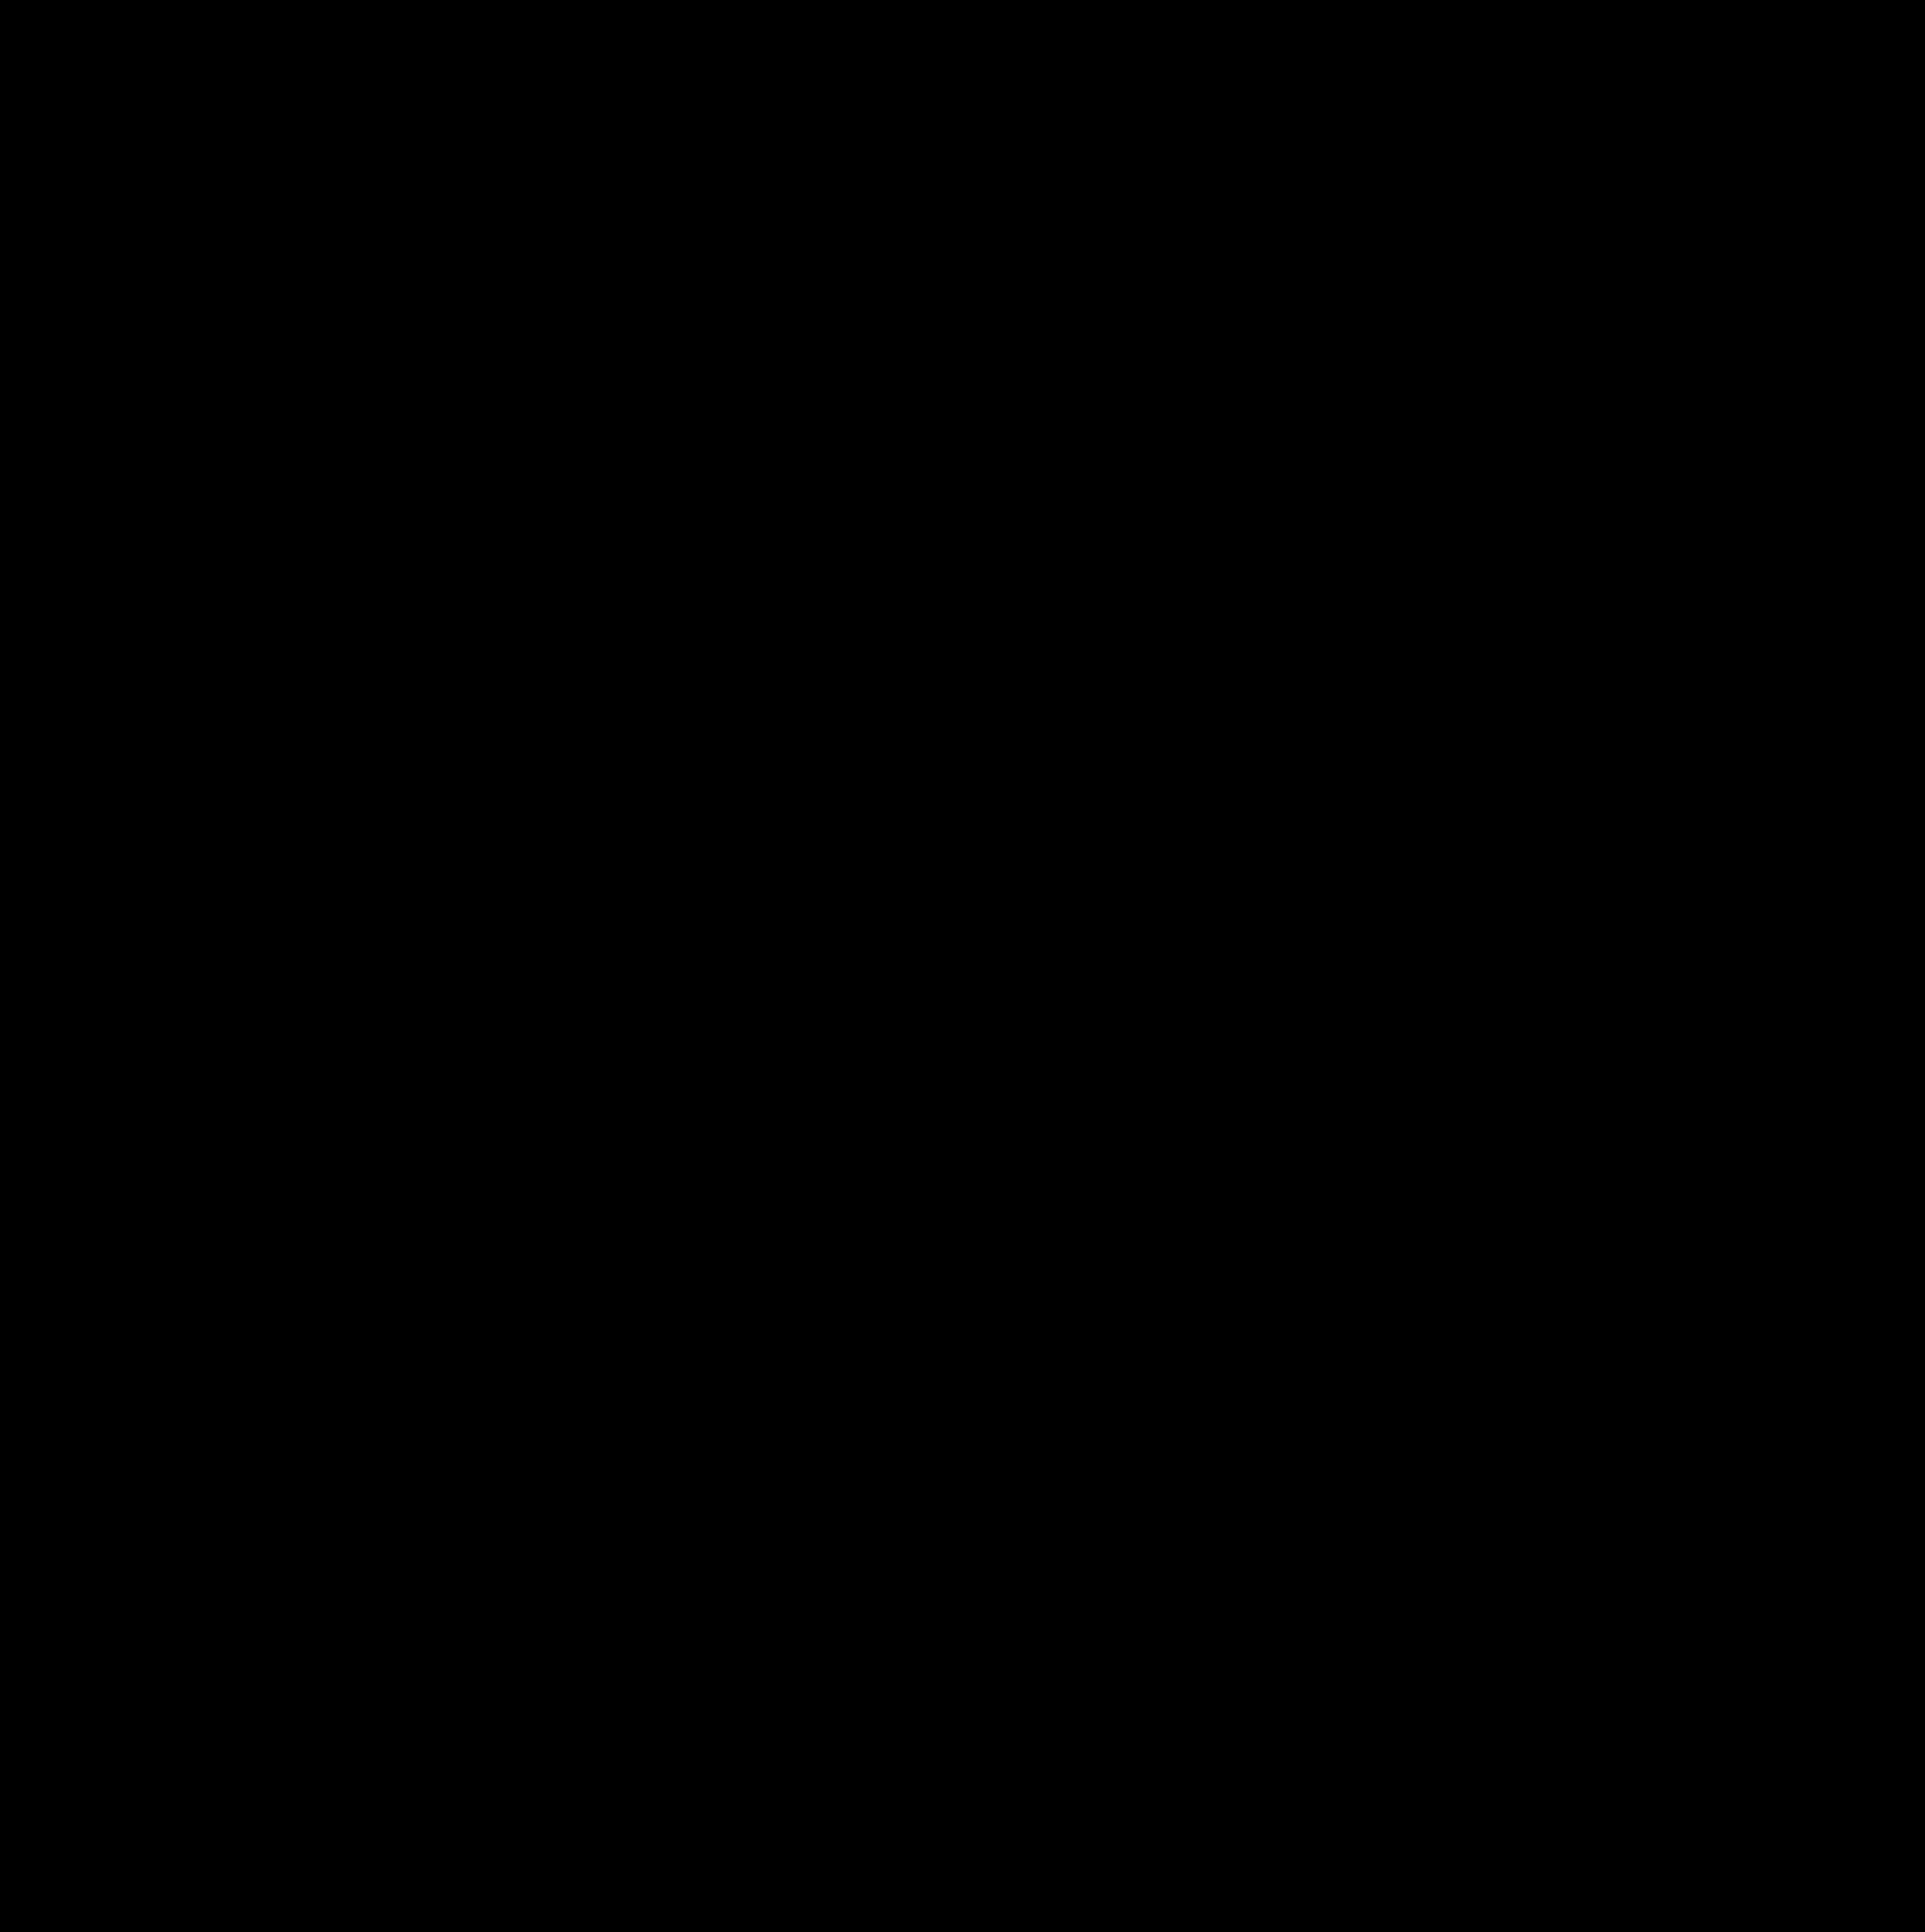 2309x2317 Sandhill Crane Silhouette Vector Clipart Image